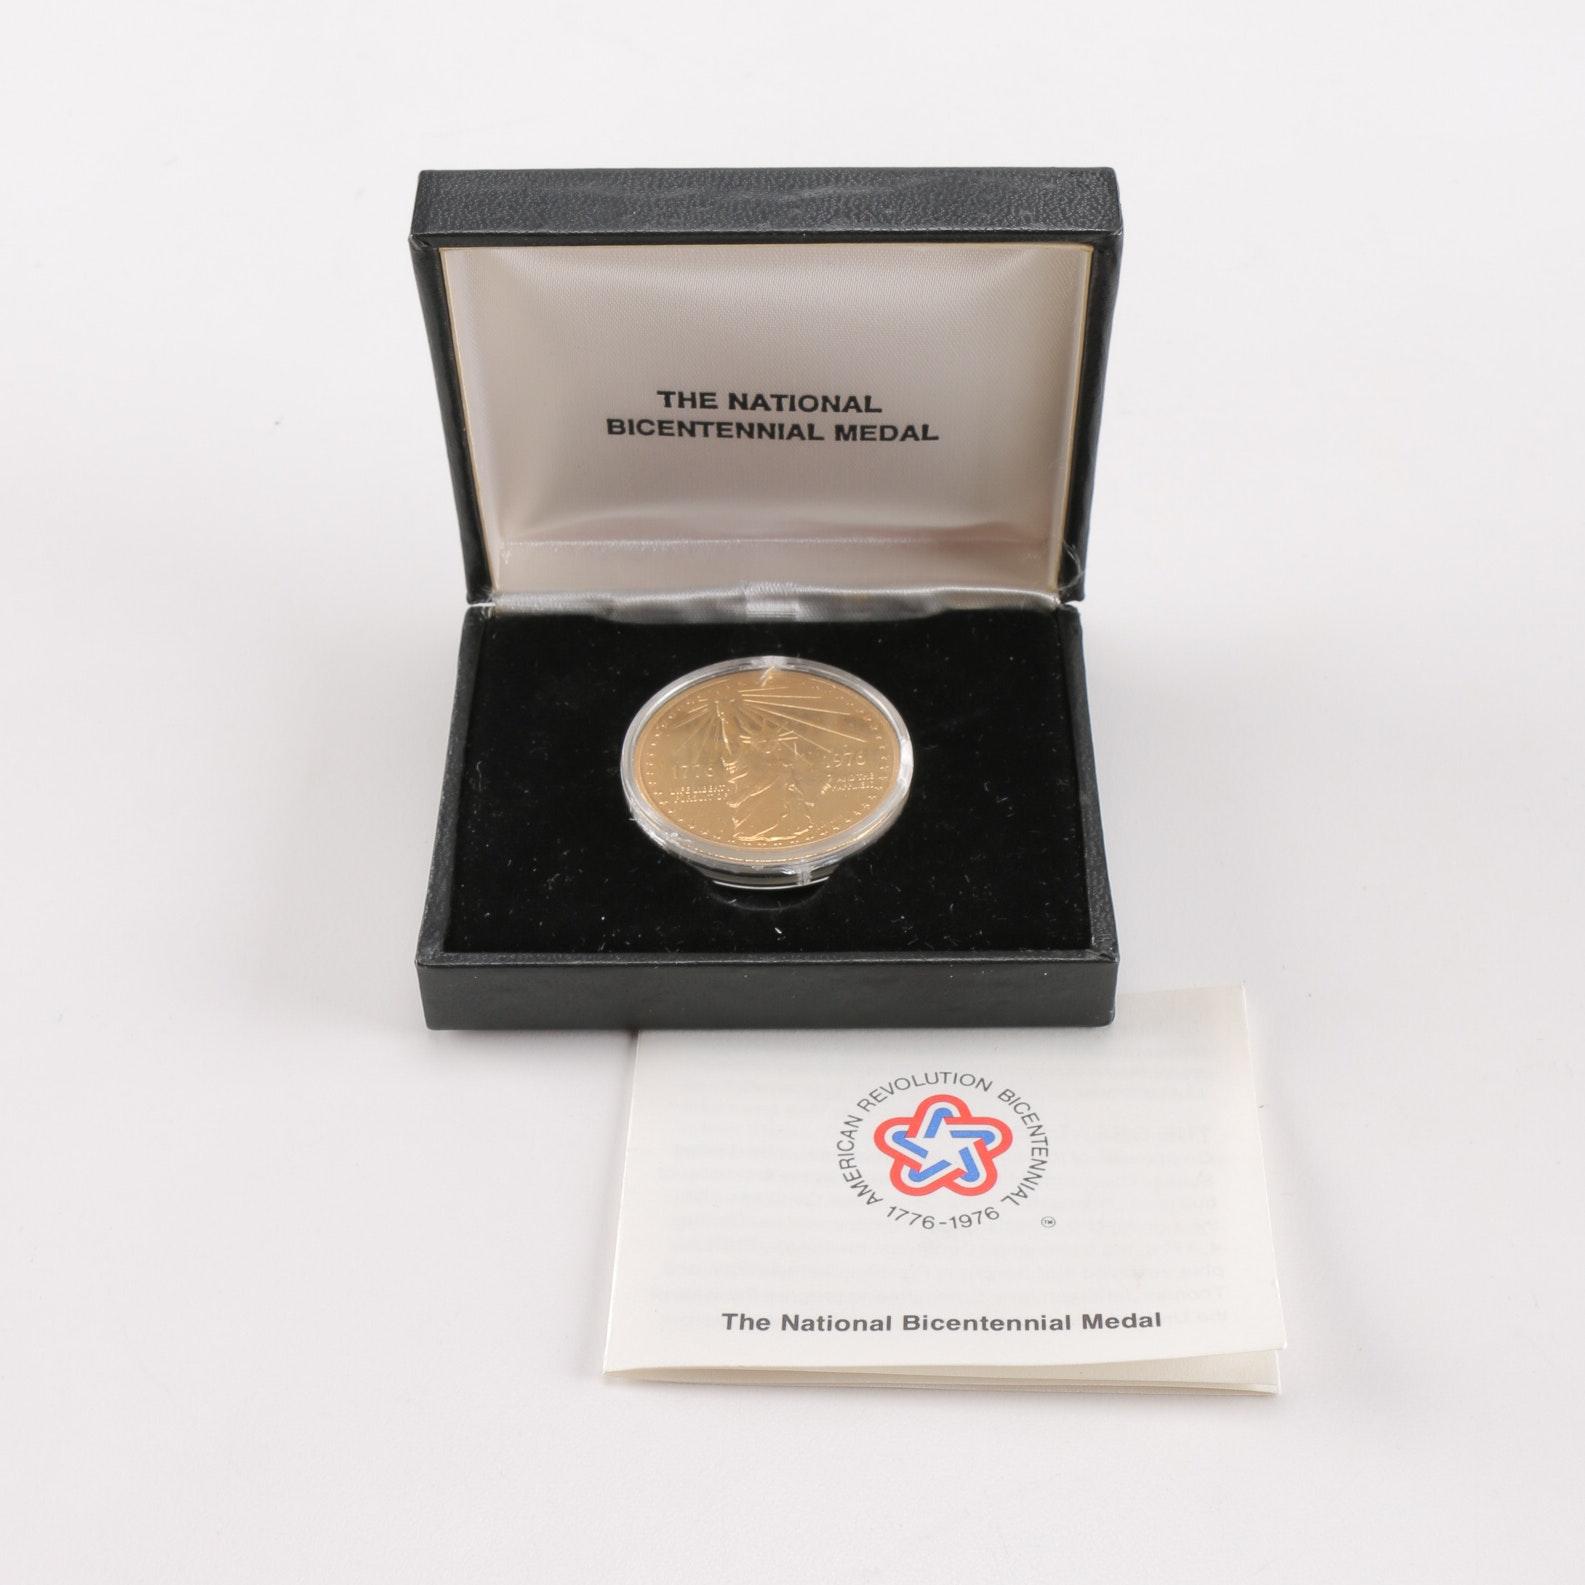 Gold Plated National Bicentennial Medal